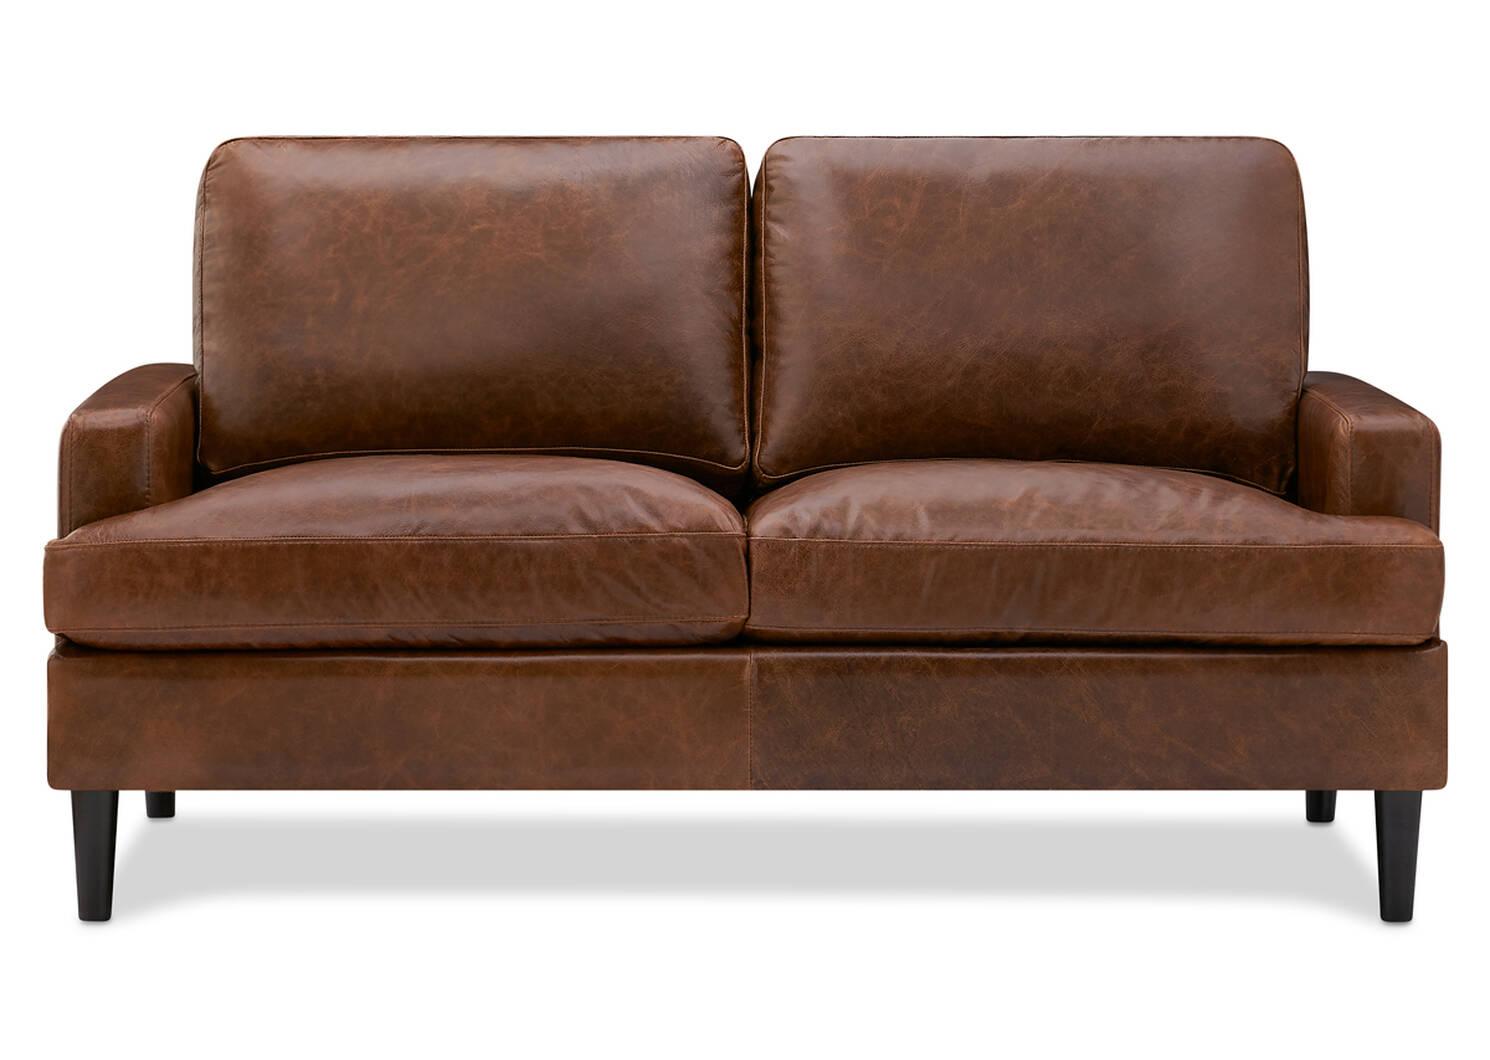 Savoy Custom Leather Loveseat